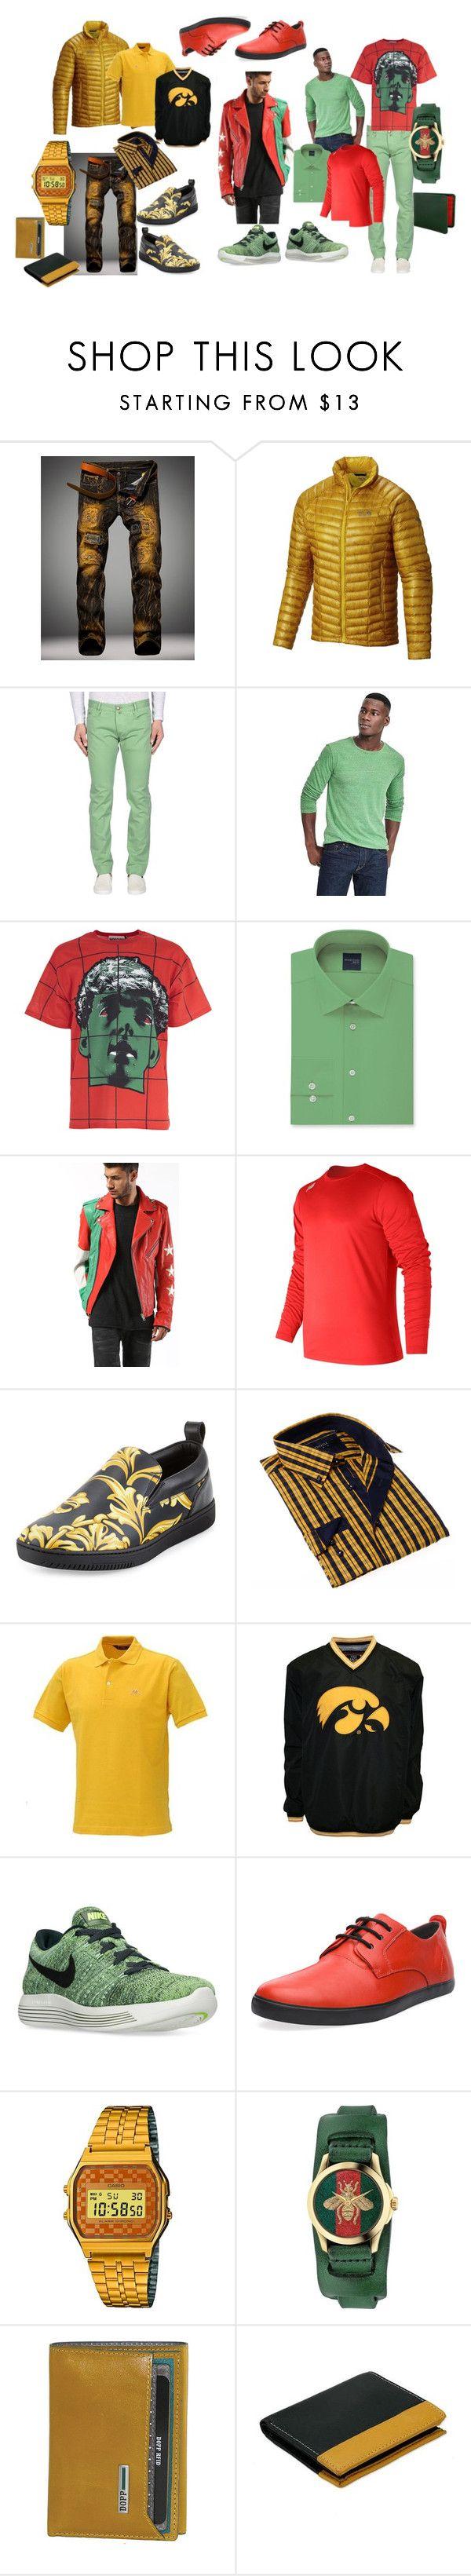 """men's chic"" by ruslana-sadova ❤ liked on Polyvore featuring Mountain Hardwear, L.B.M. 1911, Banana Republic, Moschino, Madison, Diesel, New Balance, Versace, BRIO and ROBE DI KAPPA"